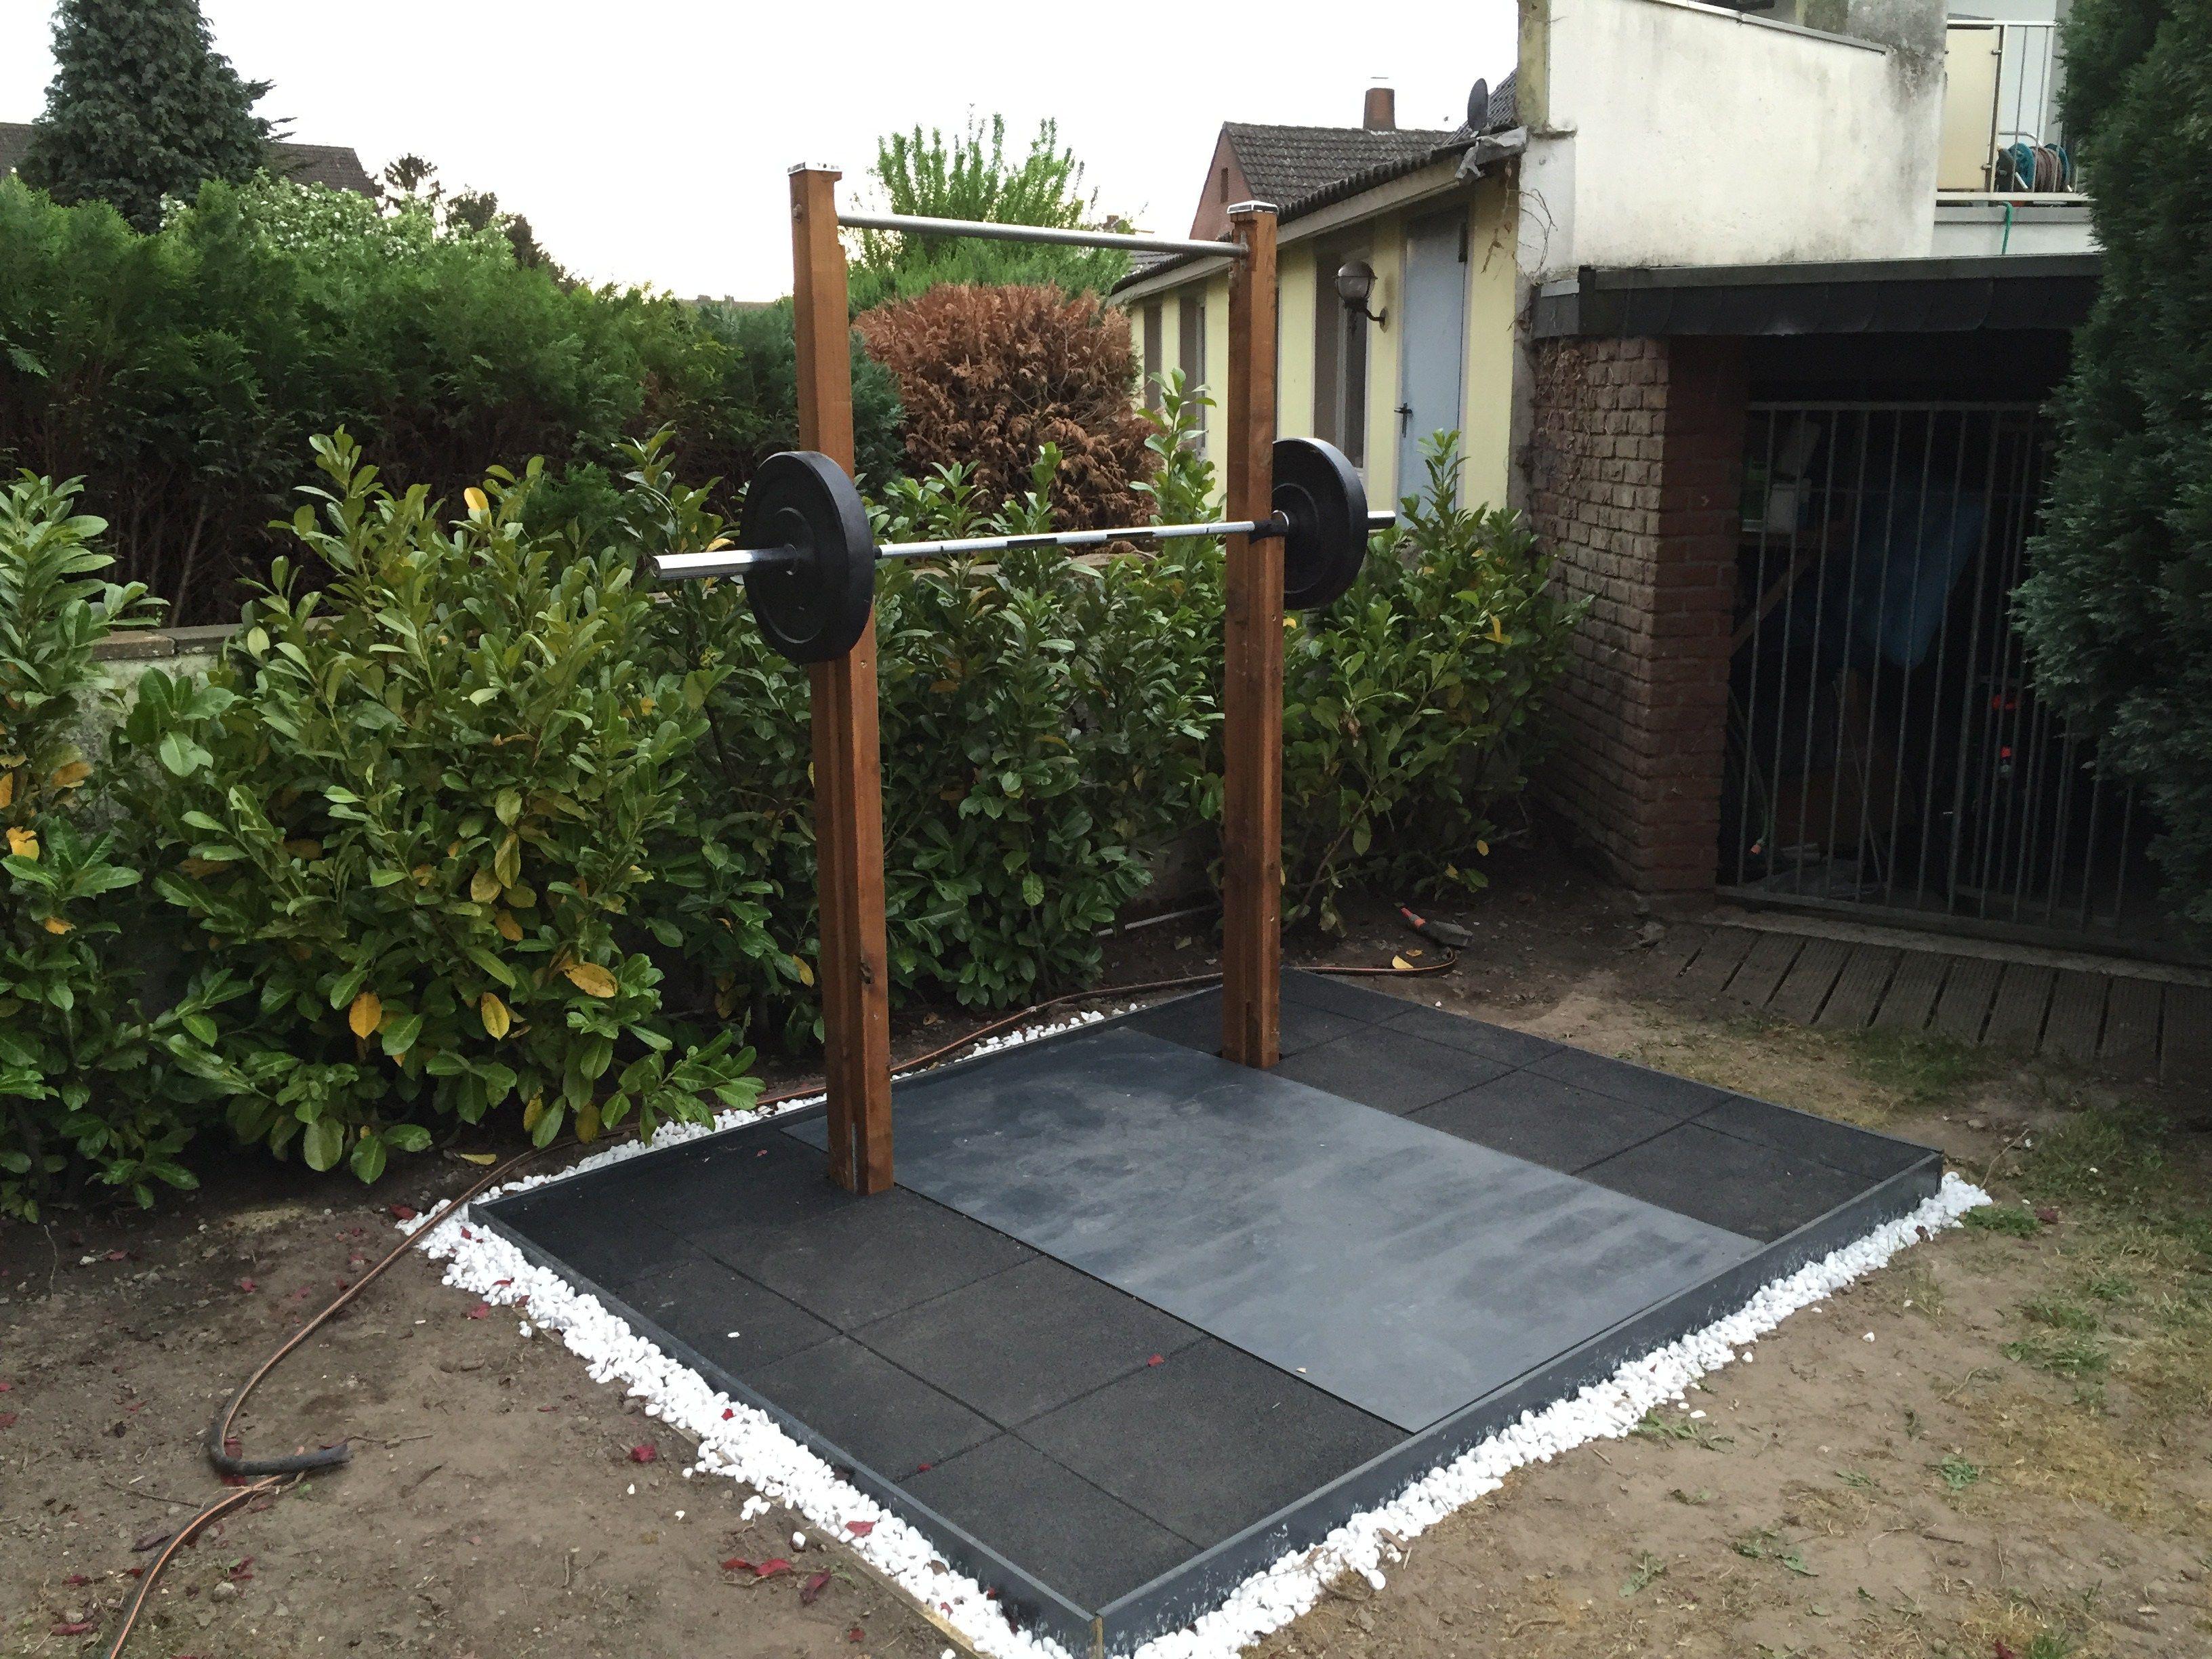 bars squat power dip garage student rack the starving diy gym wooden